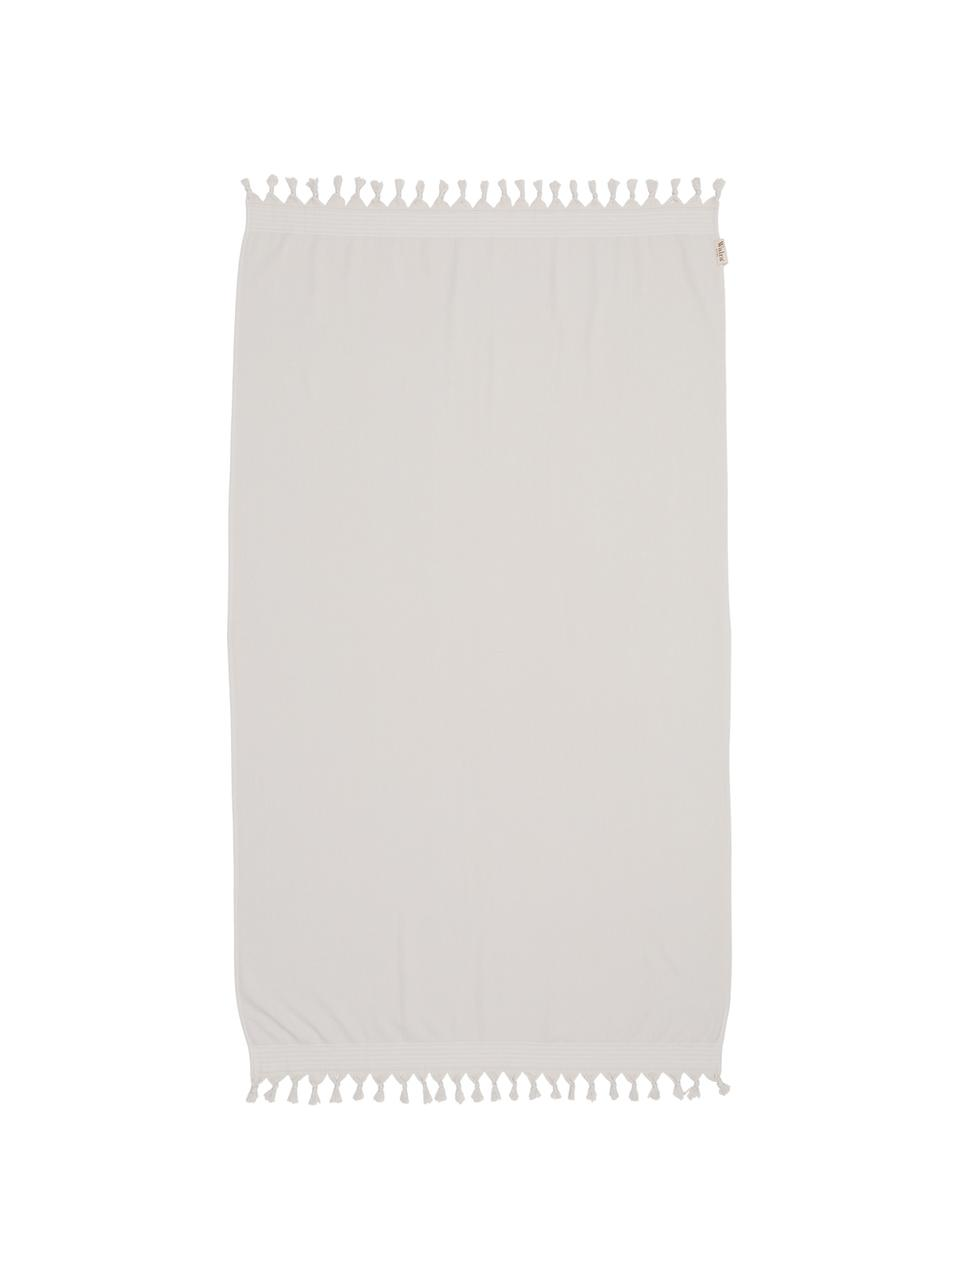 Telo mare Soft Cotton, Retro: Terry, Beige chiaro, bianco, Larg. 100 x Lung. 180 cm